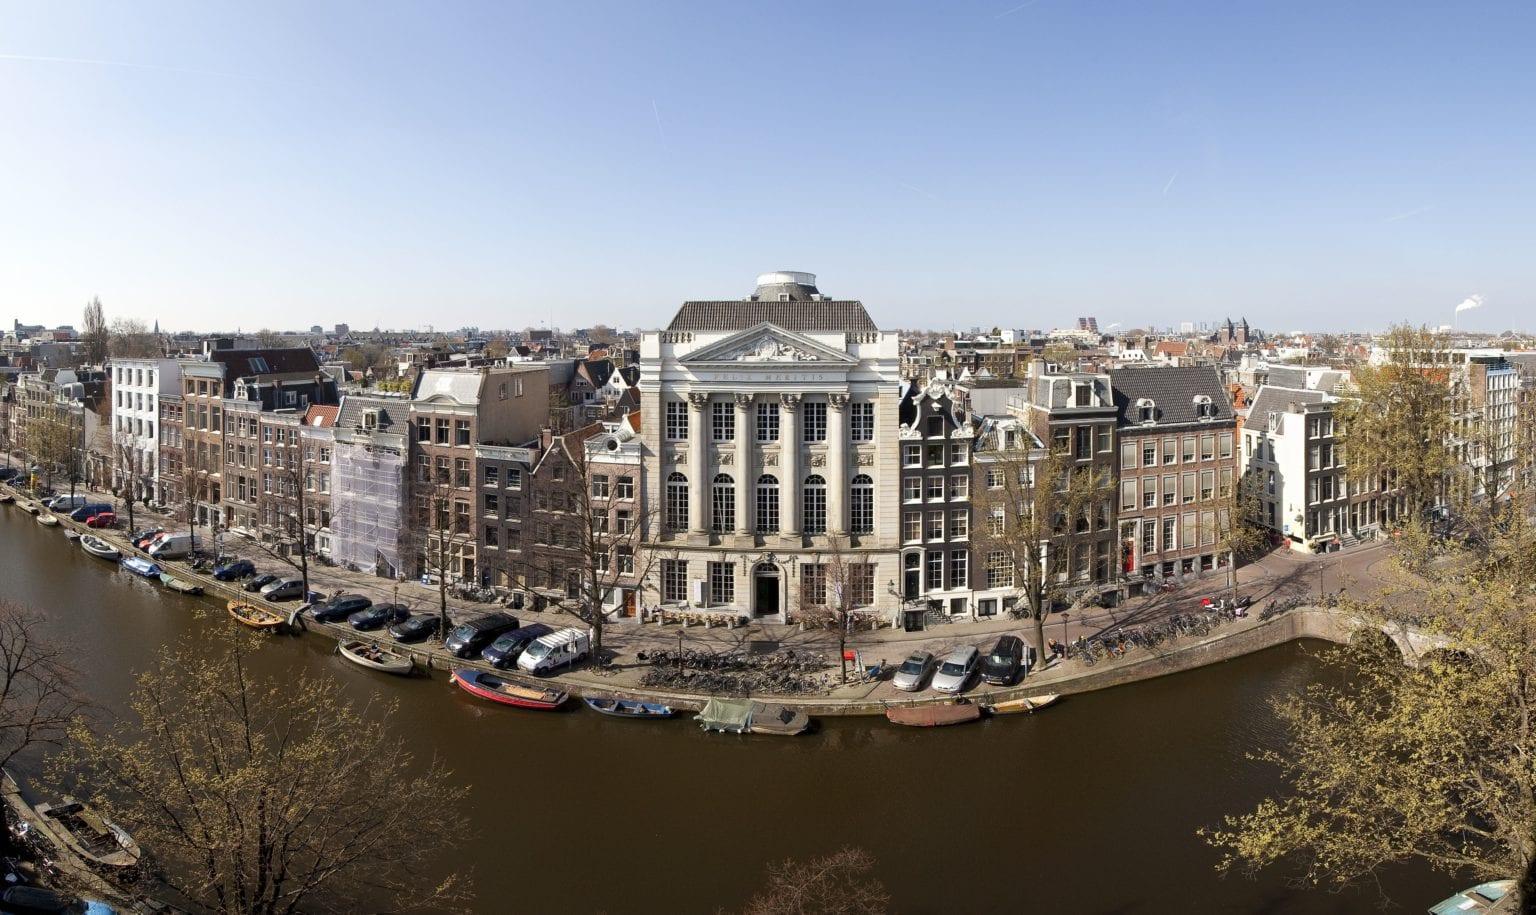 Nederland, Amsterdam, 29 maart 2011panorama, Keizersgracht, Felix Meritis, gracht, canalFoto: Thomas Schlijper